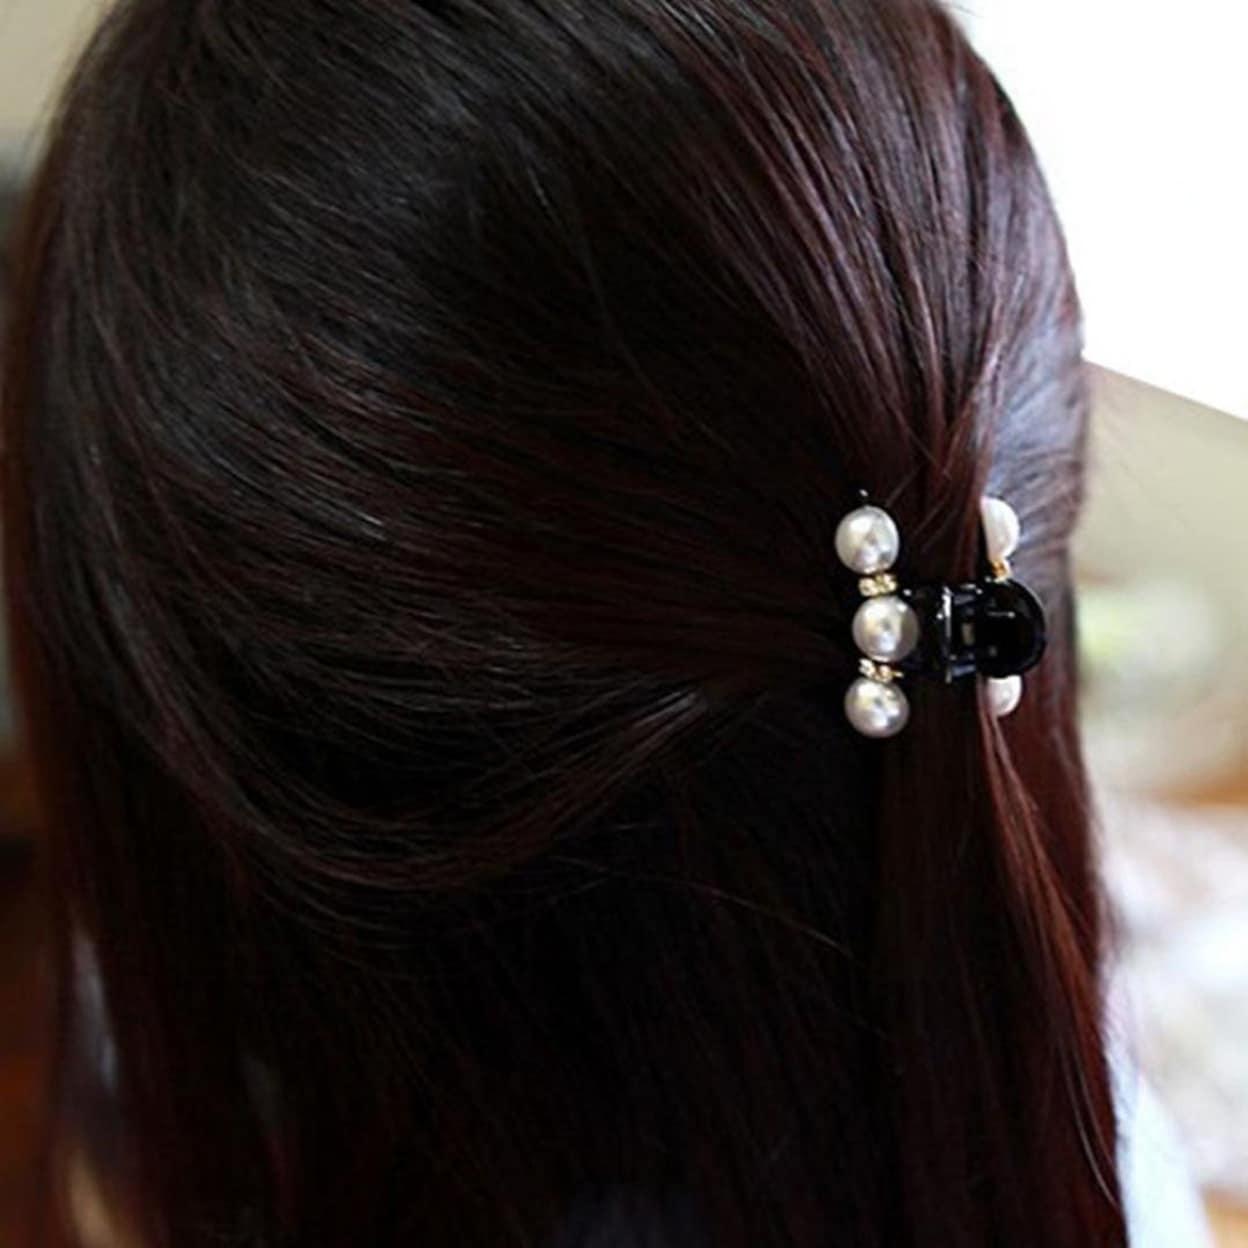 Details about  /Women Pearl Rhinestone Hair Claws Geometric Hair Clips Crab Hairpin Barrettes